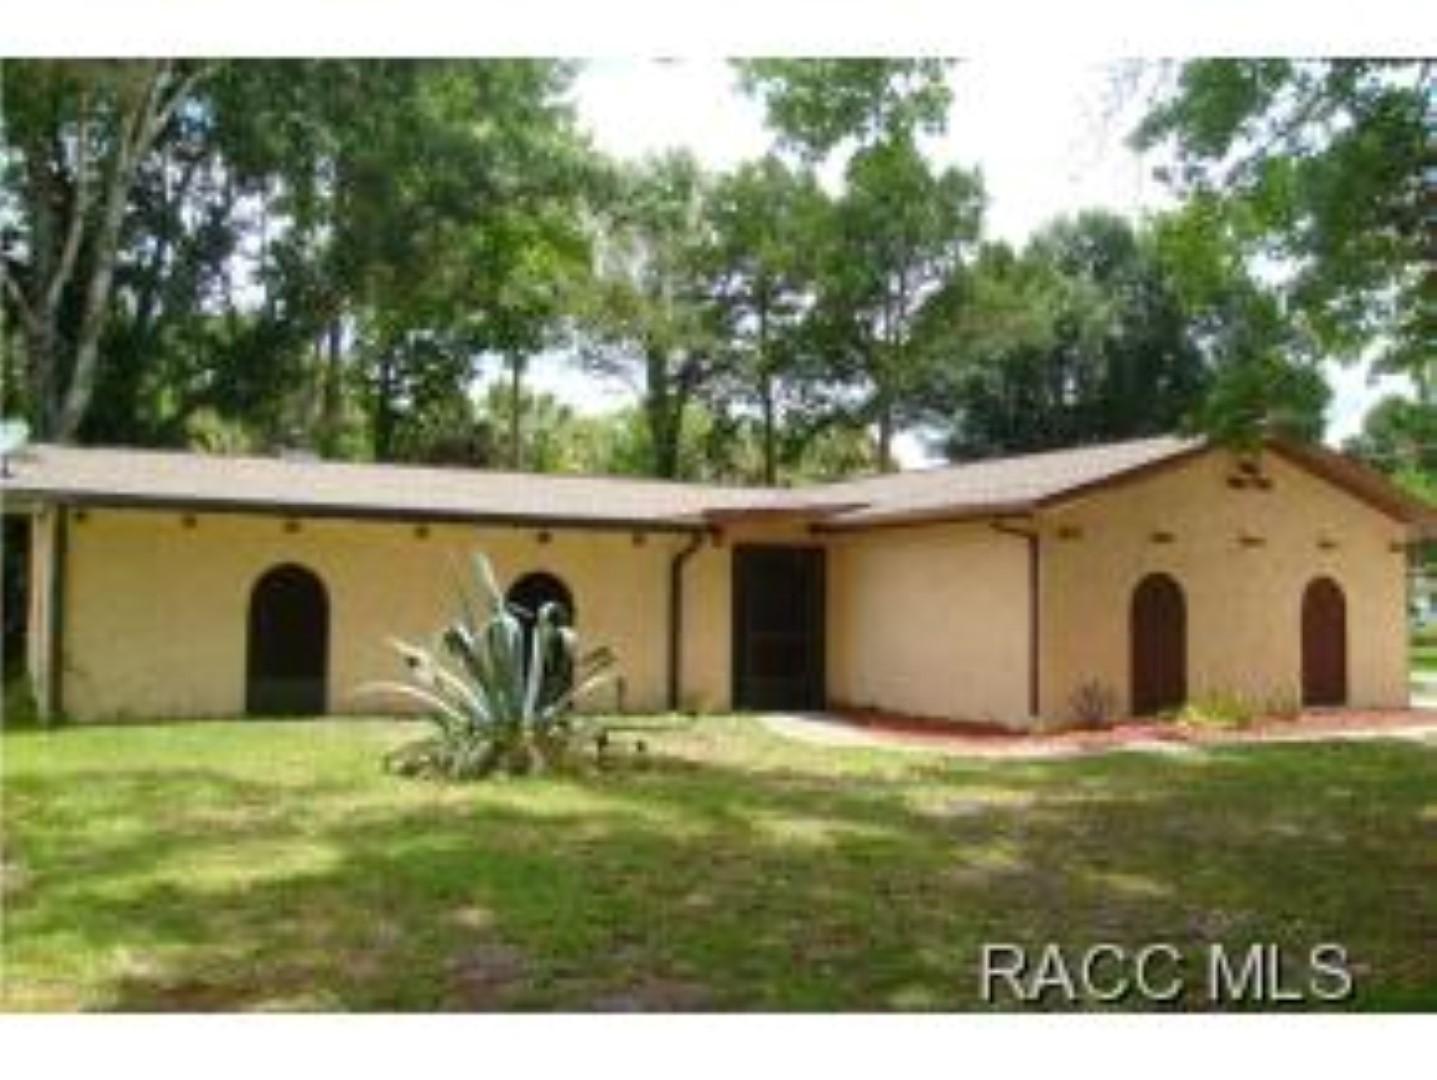 9905 W. Halls River Rd., Homosassa, Florida 34448